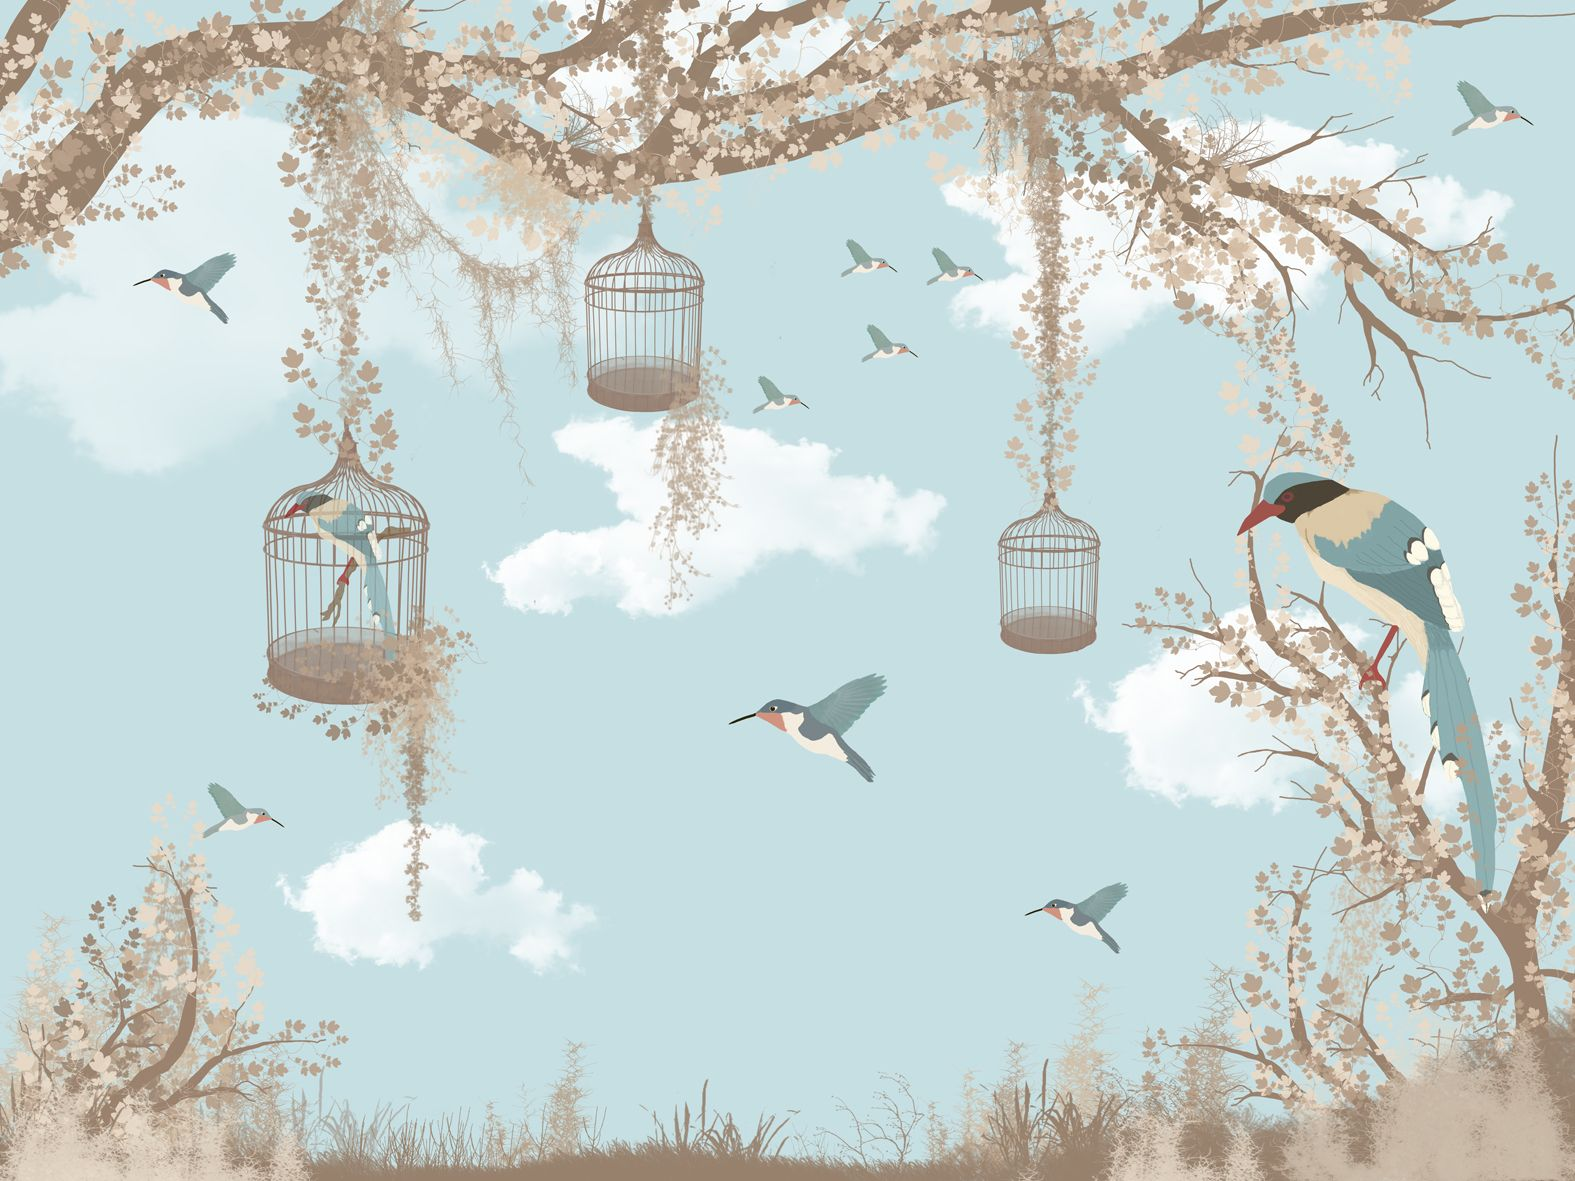 Vintage Little Floral And Birds Wallpaper Mural Bird Wallpaper Mural Wallpaper Vintage Bird Wallpaper